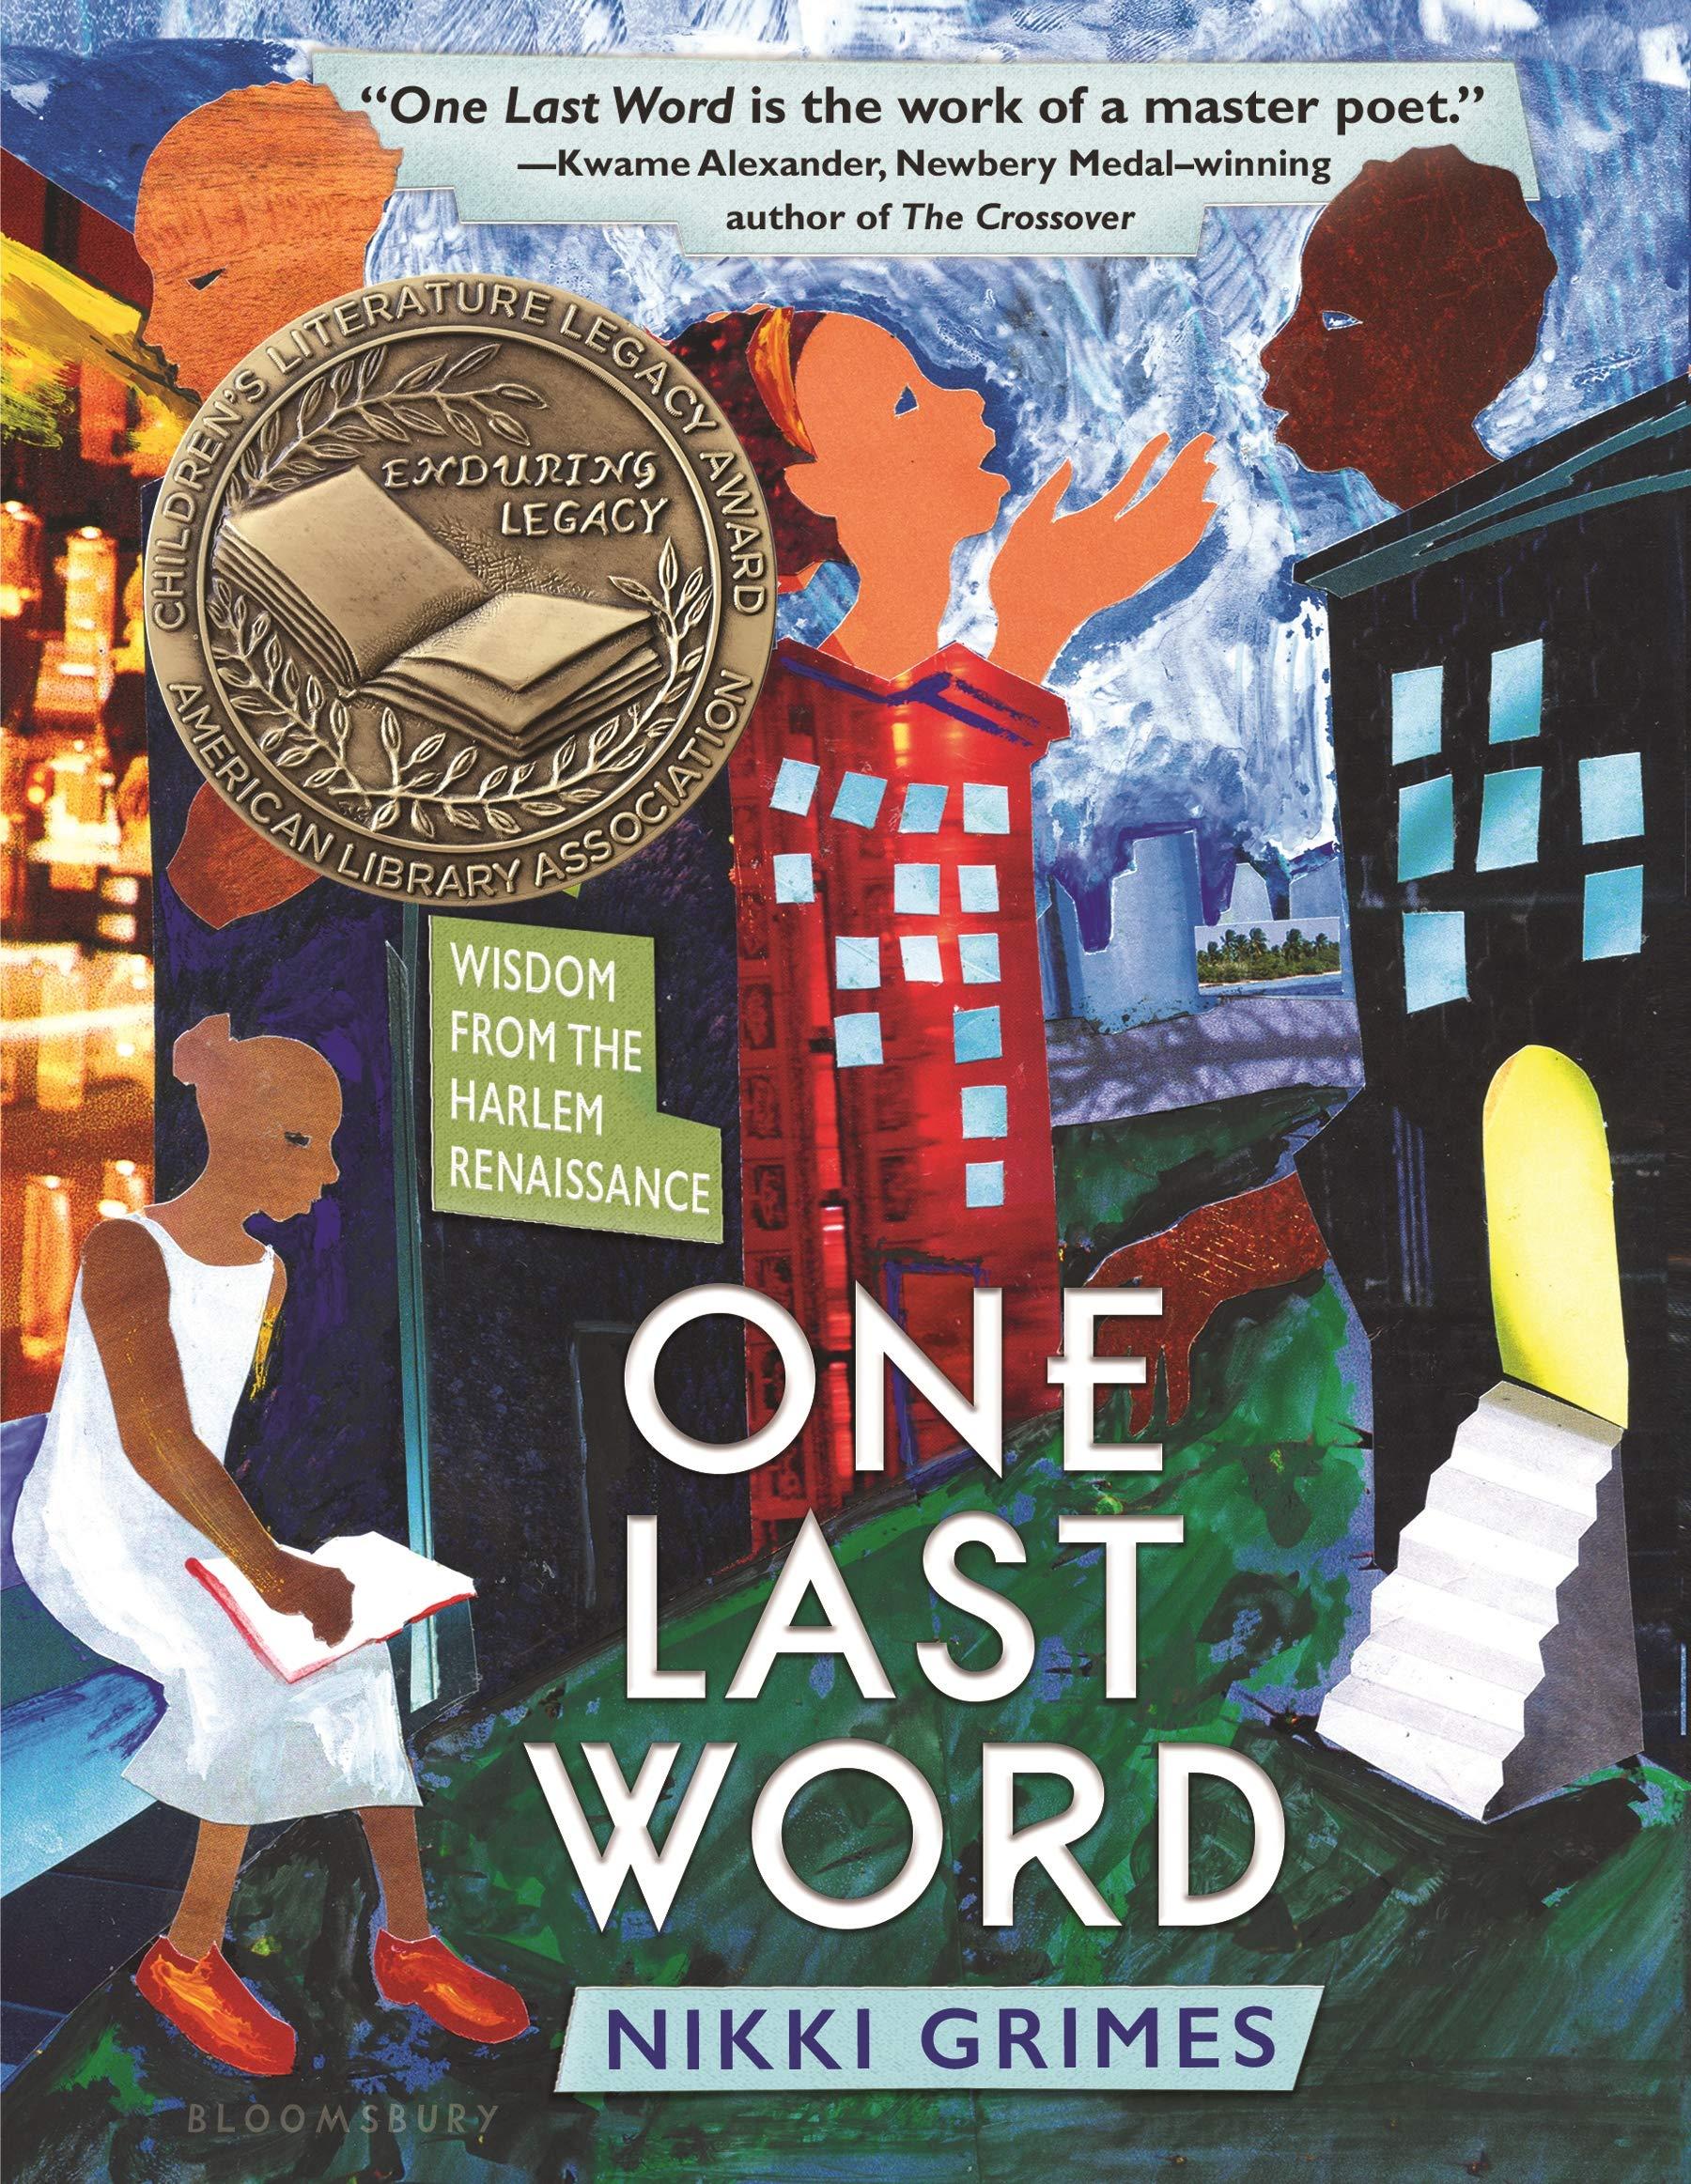 Amazon.com: One Last Word: Wisdom from the Harlem Renaissance ...